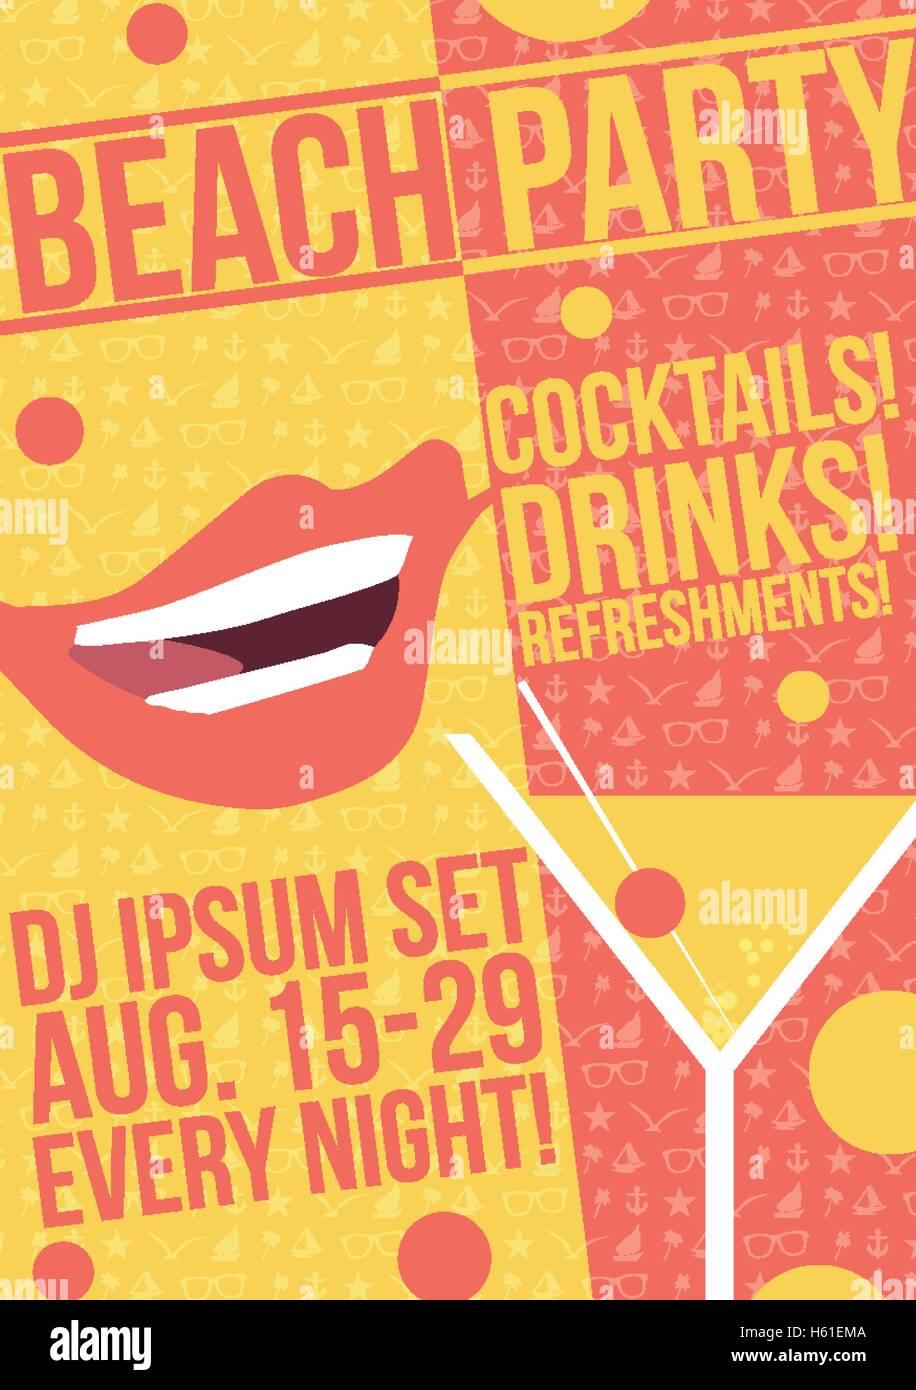 Poster design vector - Cocktail Party Retro Poster Design Vector Illustration